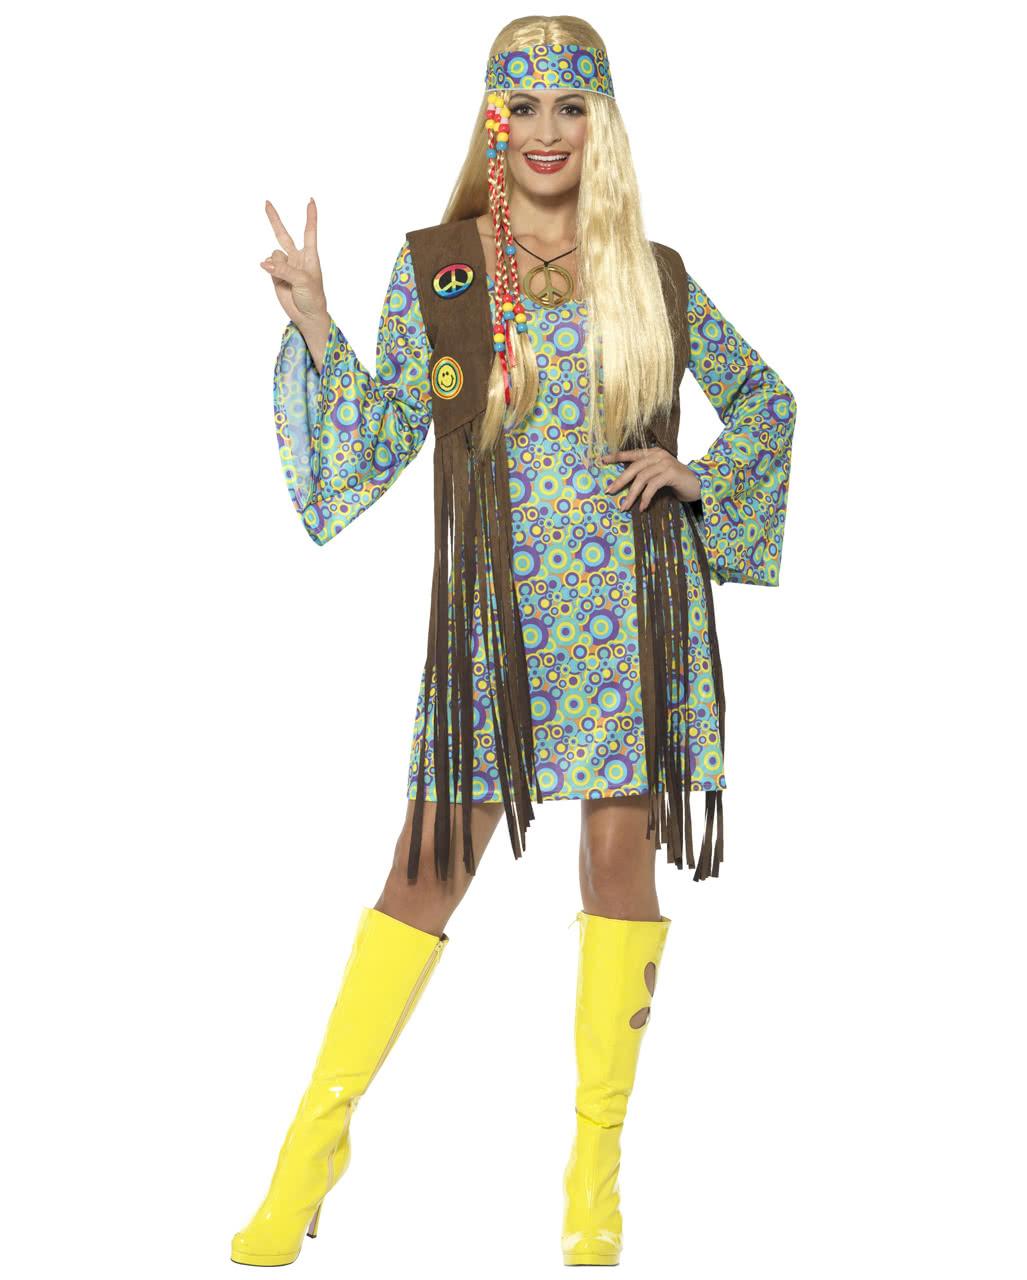 60s Hippie Chick Costume  sc 1 st  Horror-Shop & 60s Hippie Chick Costume | Carnival Costume | horror-shop.com